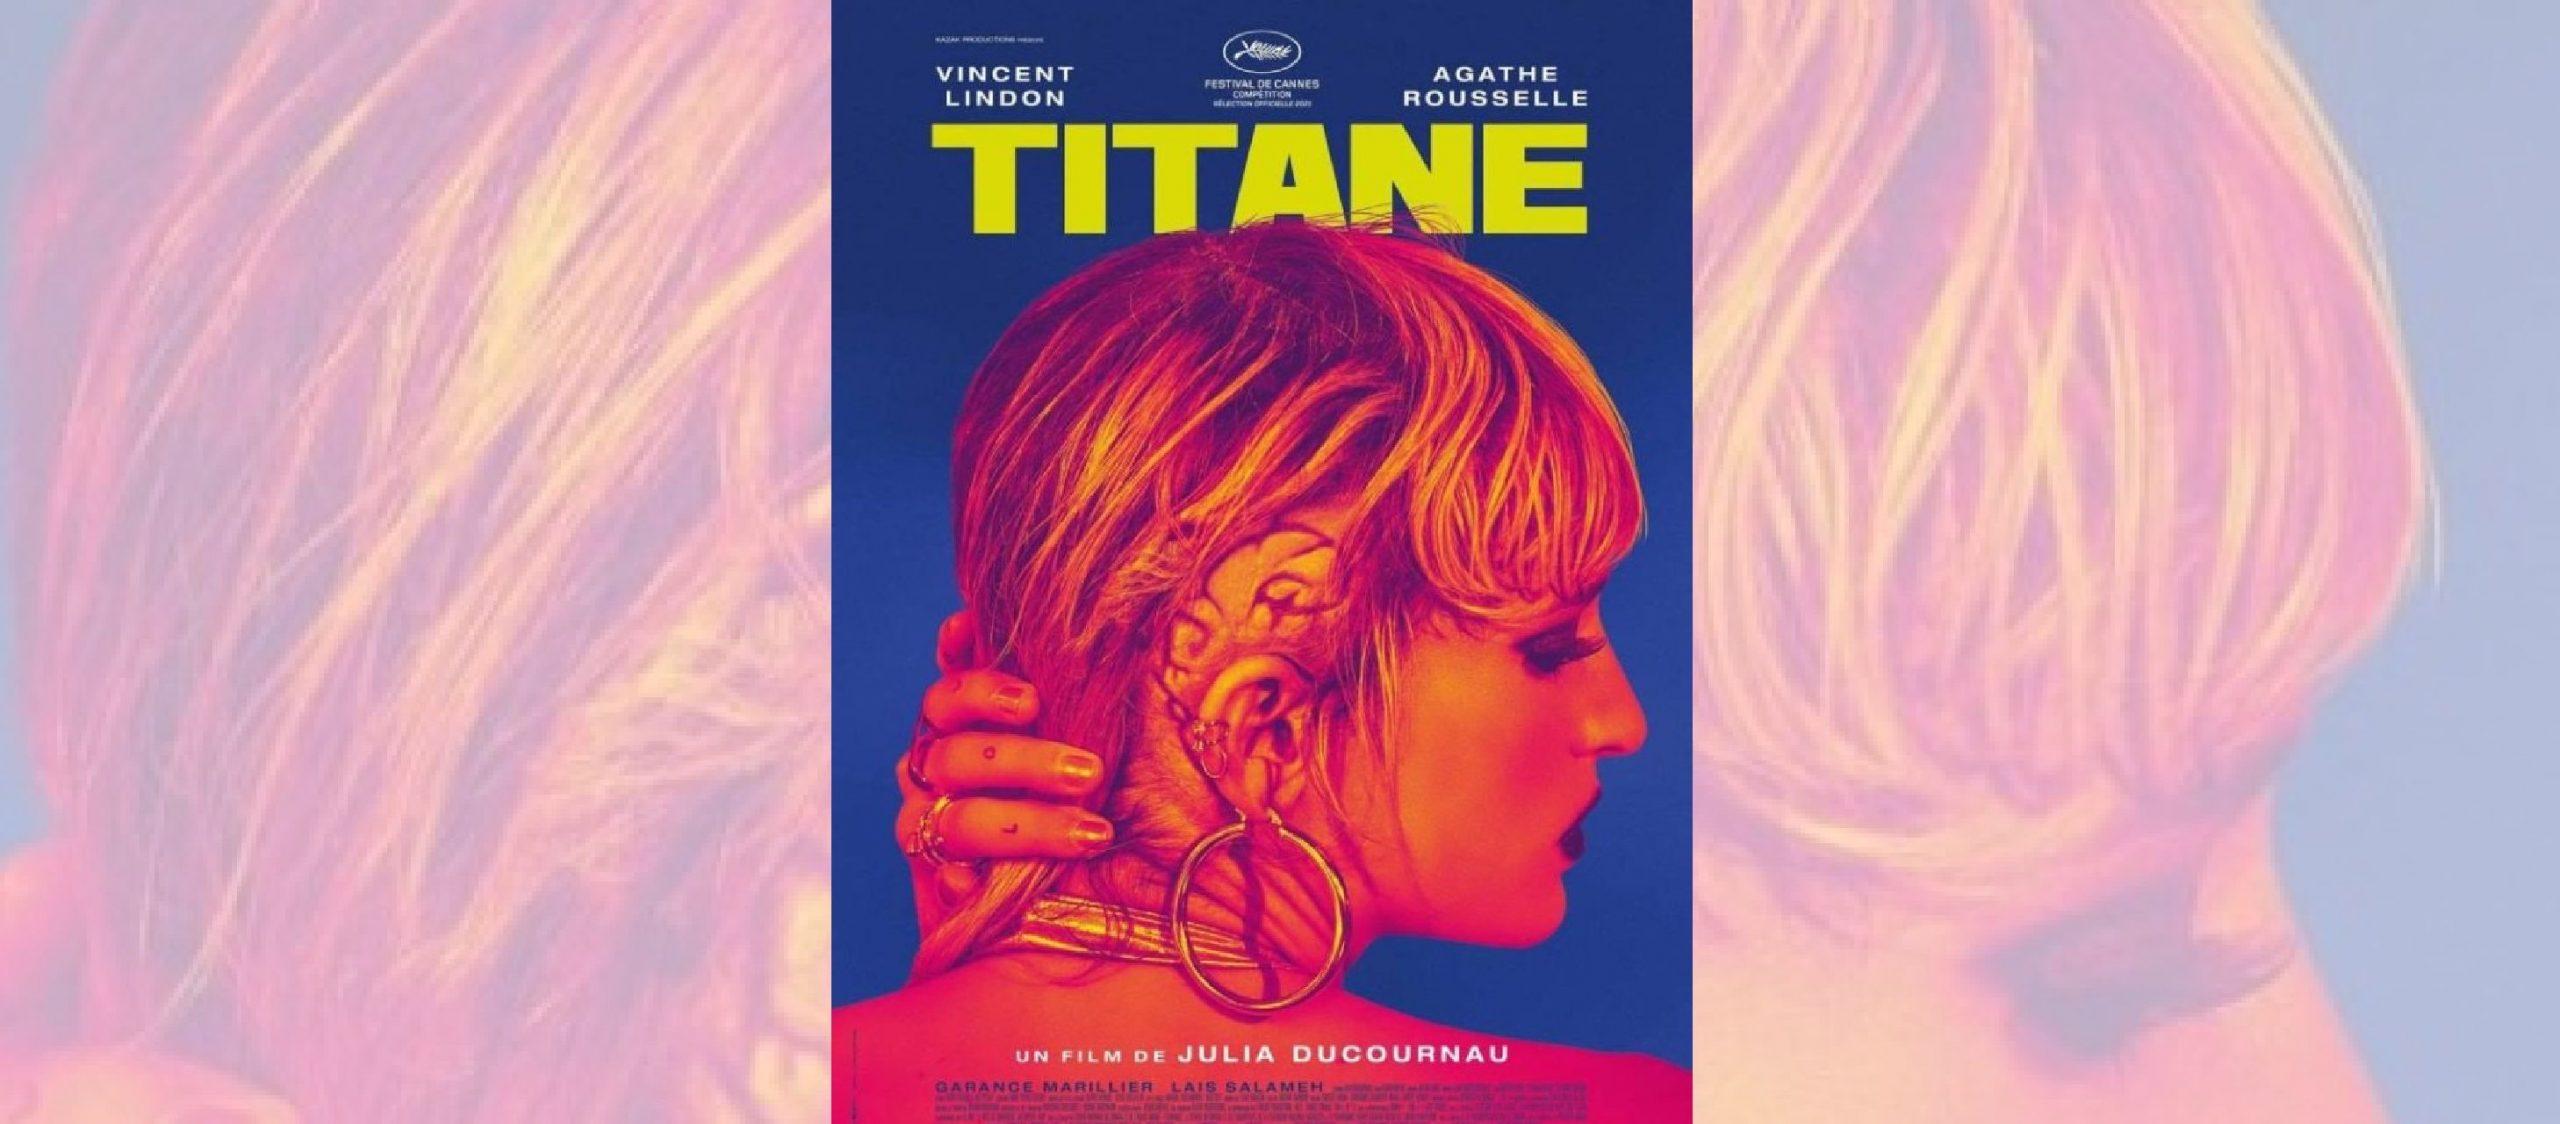 You are currently viewing اختتام مهرجان كان 74 بفوز الفيلم الفرنسي تيتان